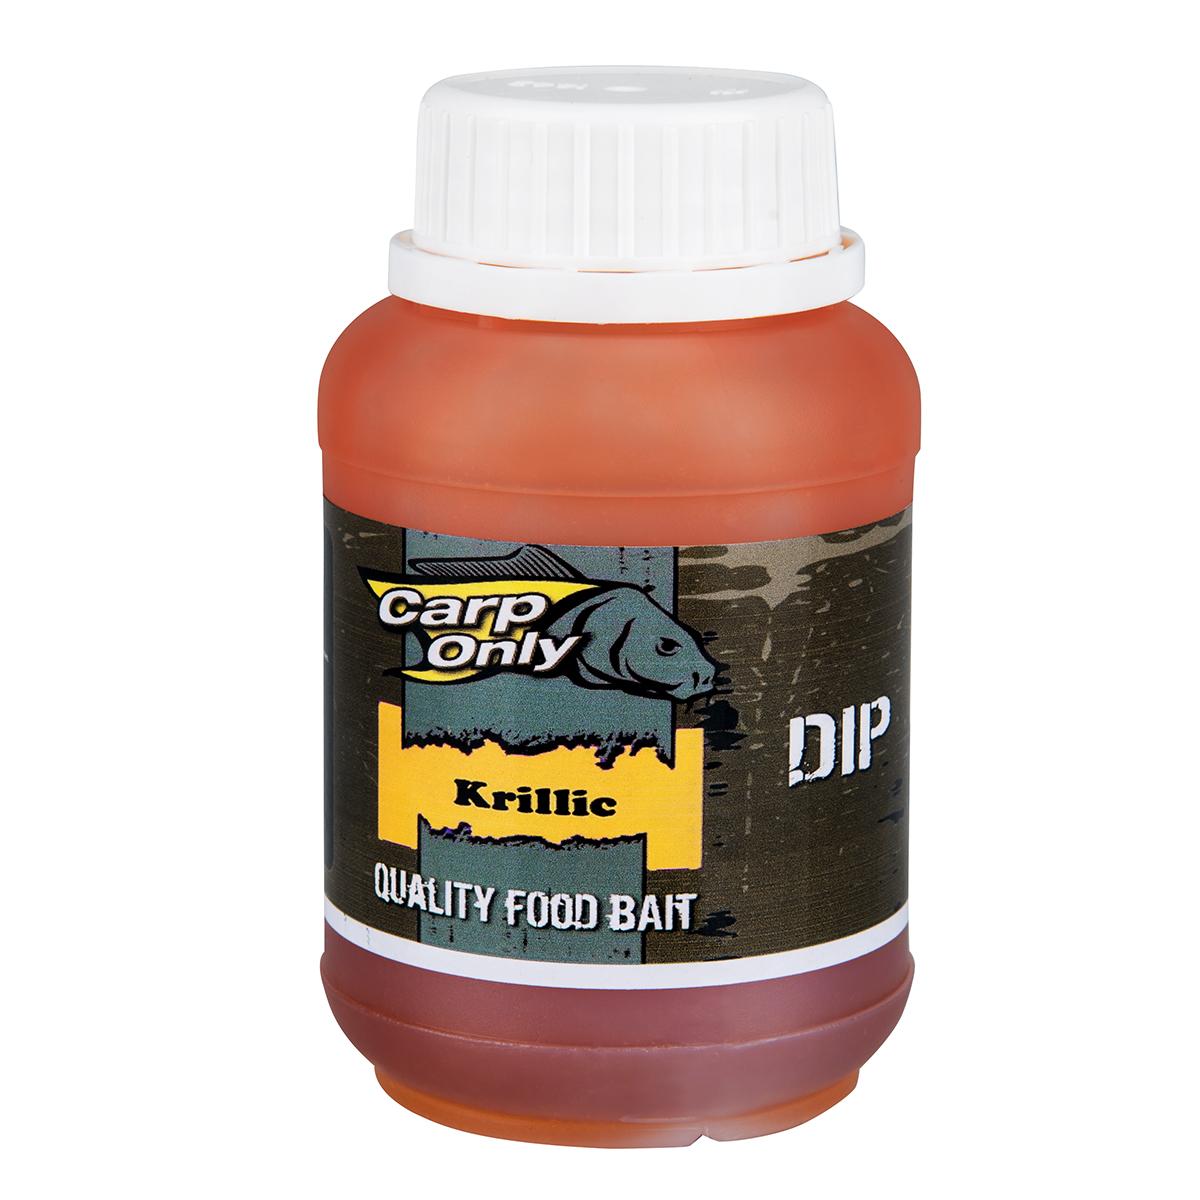 CARP ONLY Dip Krillic (Krill a Cesnak) 150ml